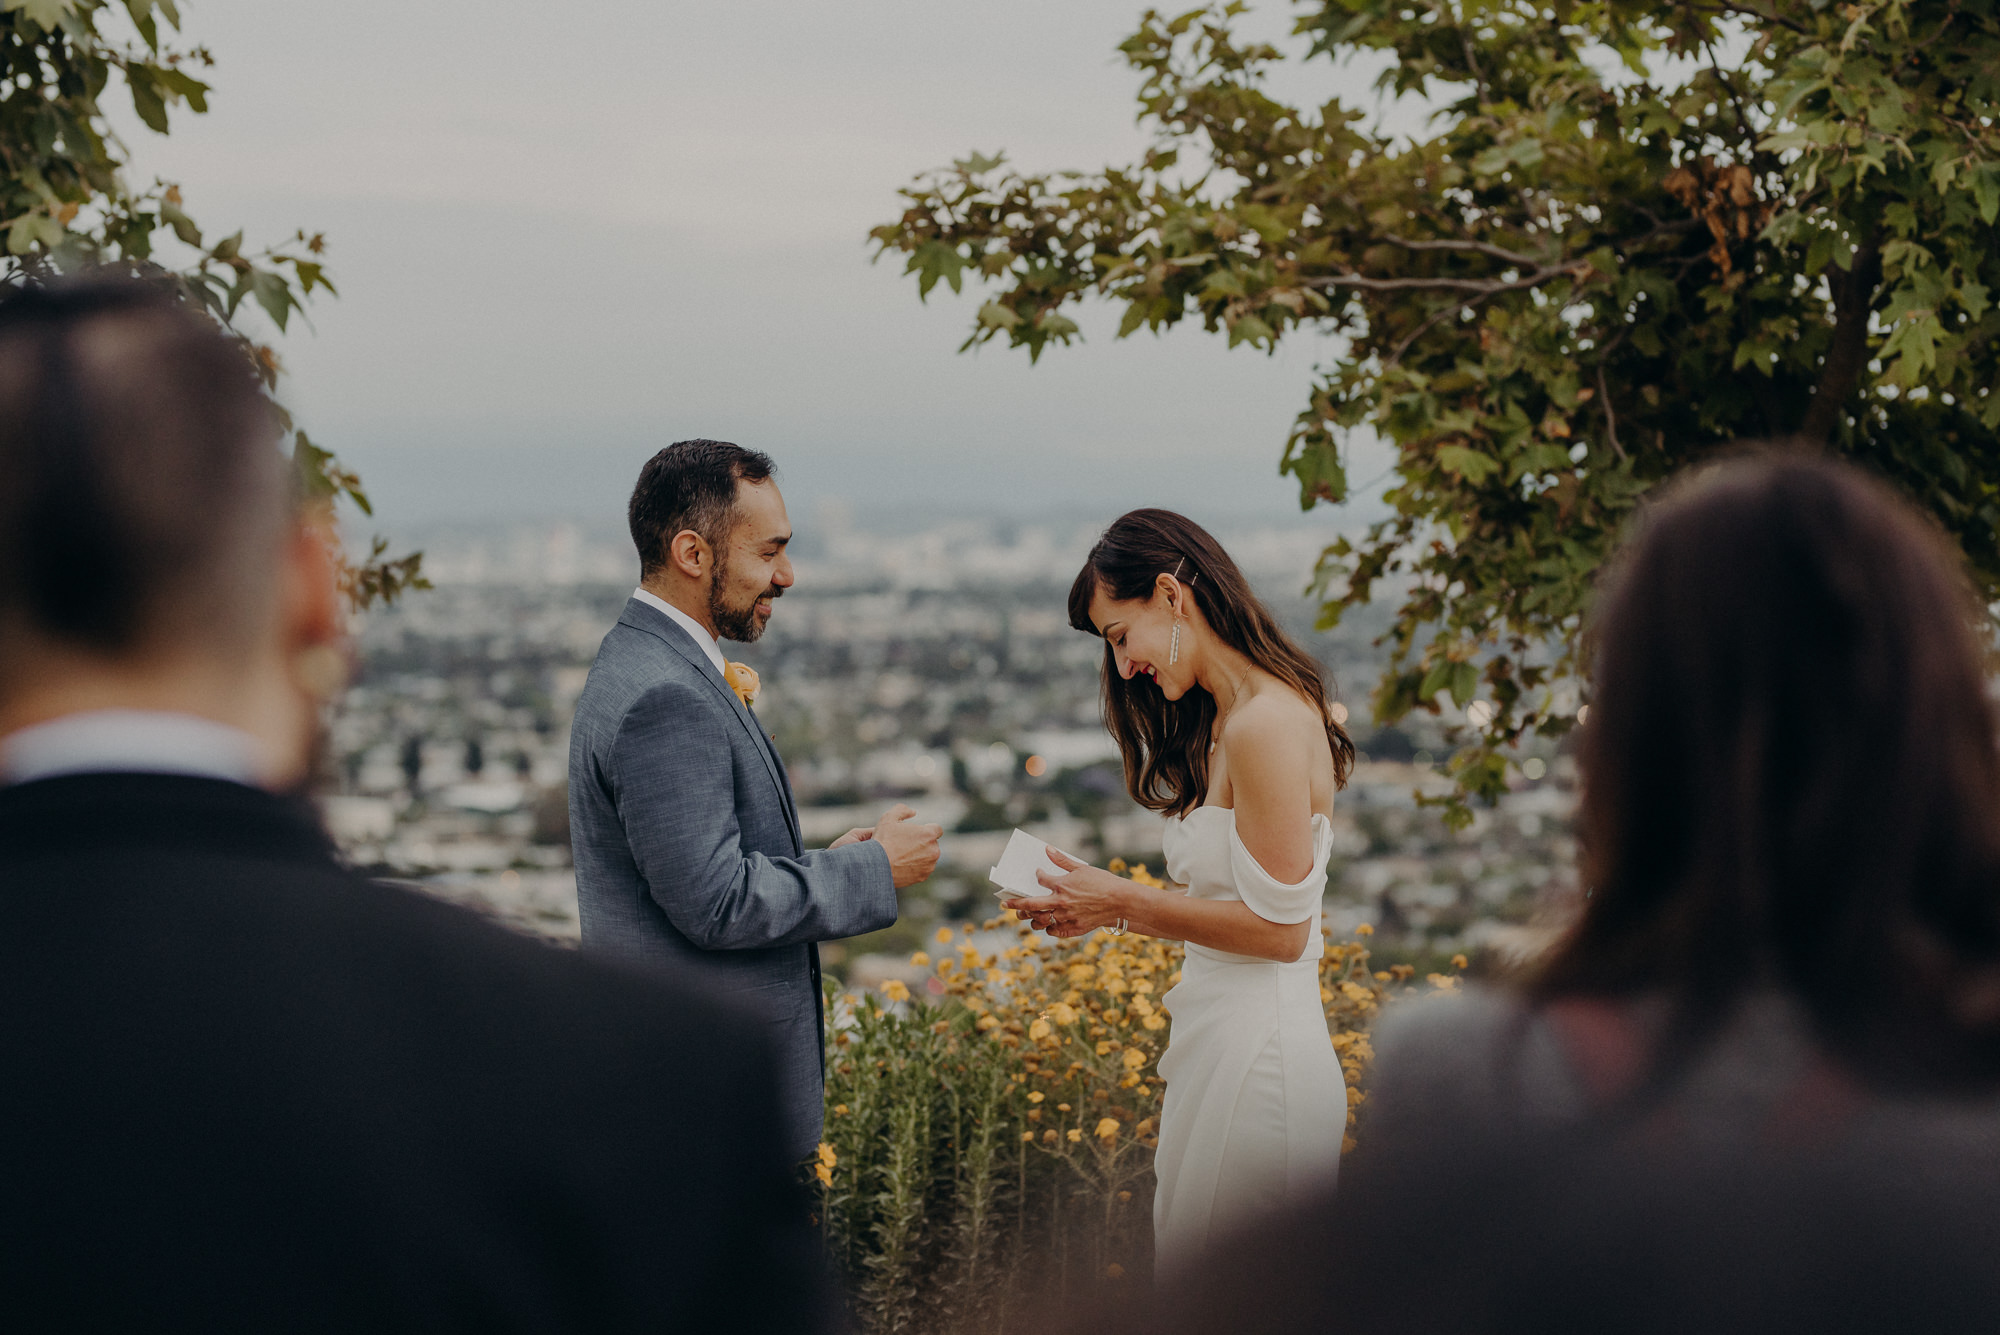 elopement photographer in los angeles - la wedding photographer - isaiahandtaylor.com-065.jpg